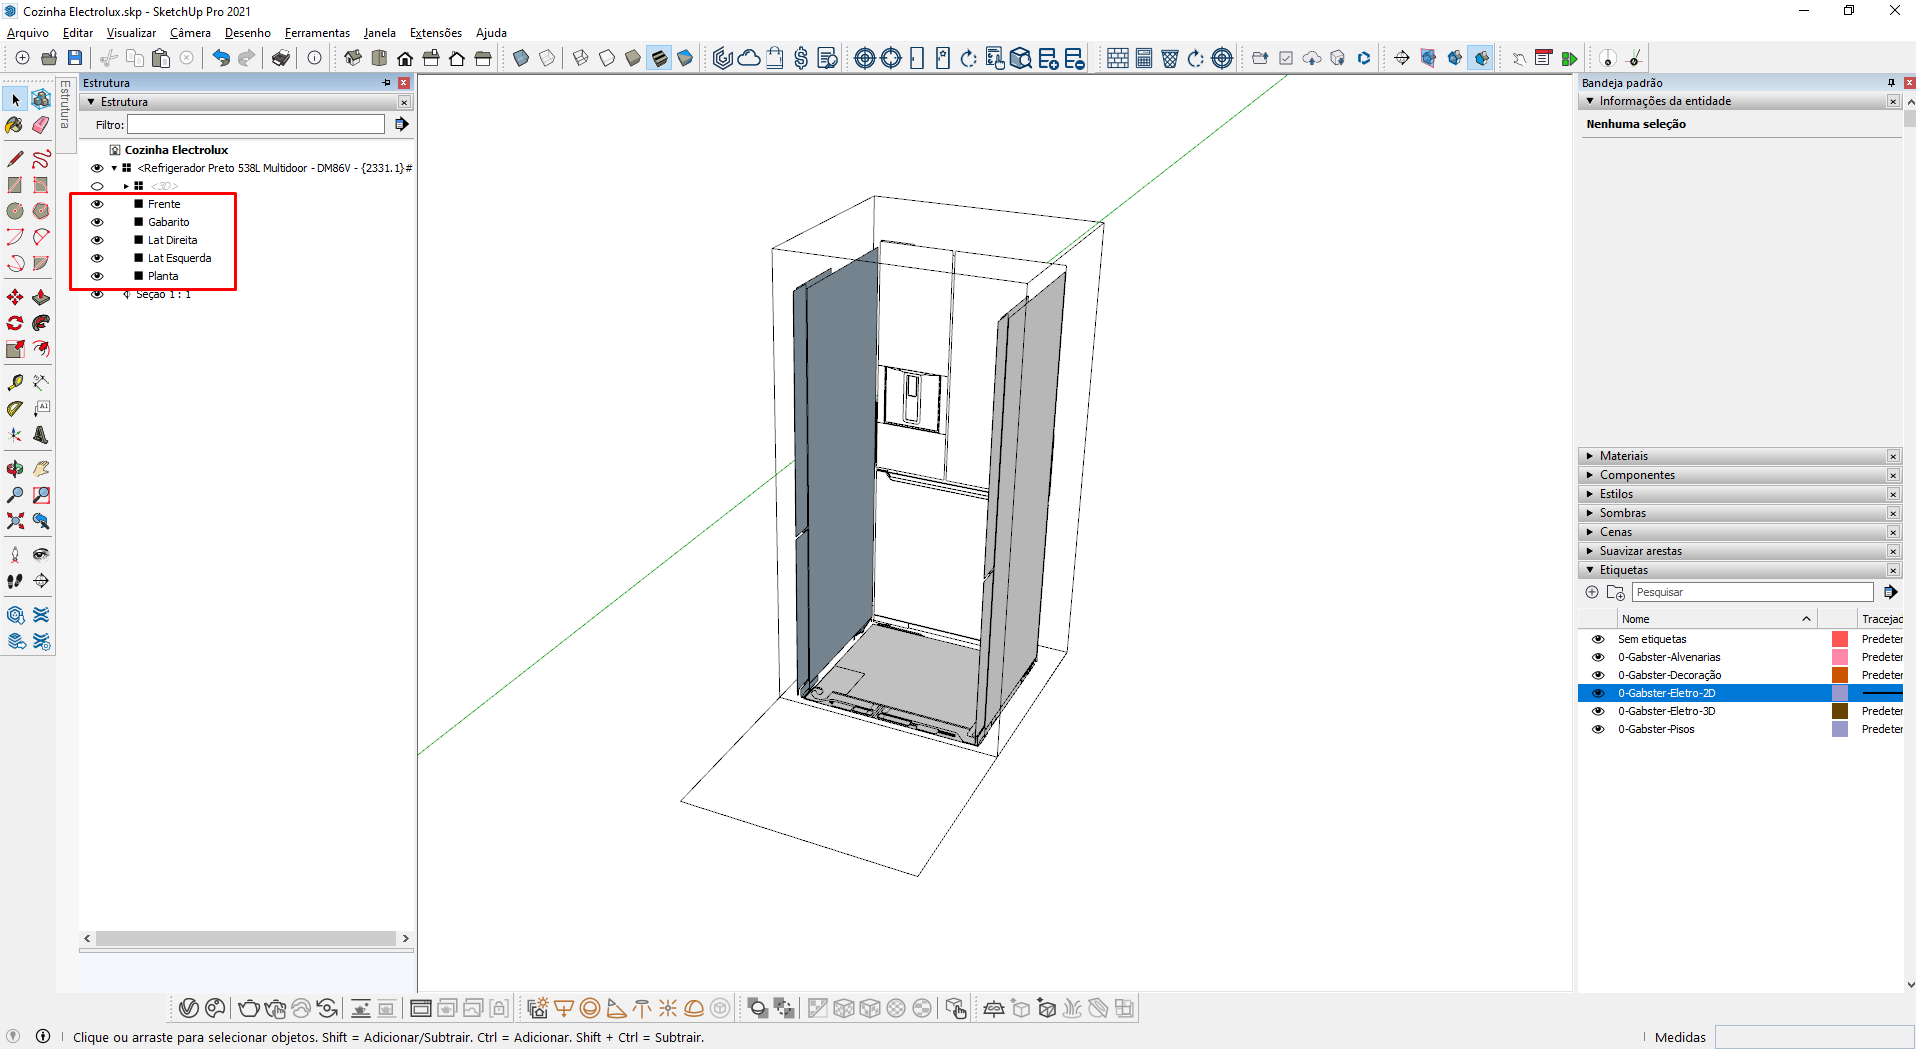 gabster estrutura blocos sketchup